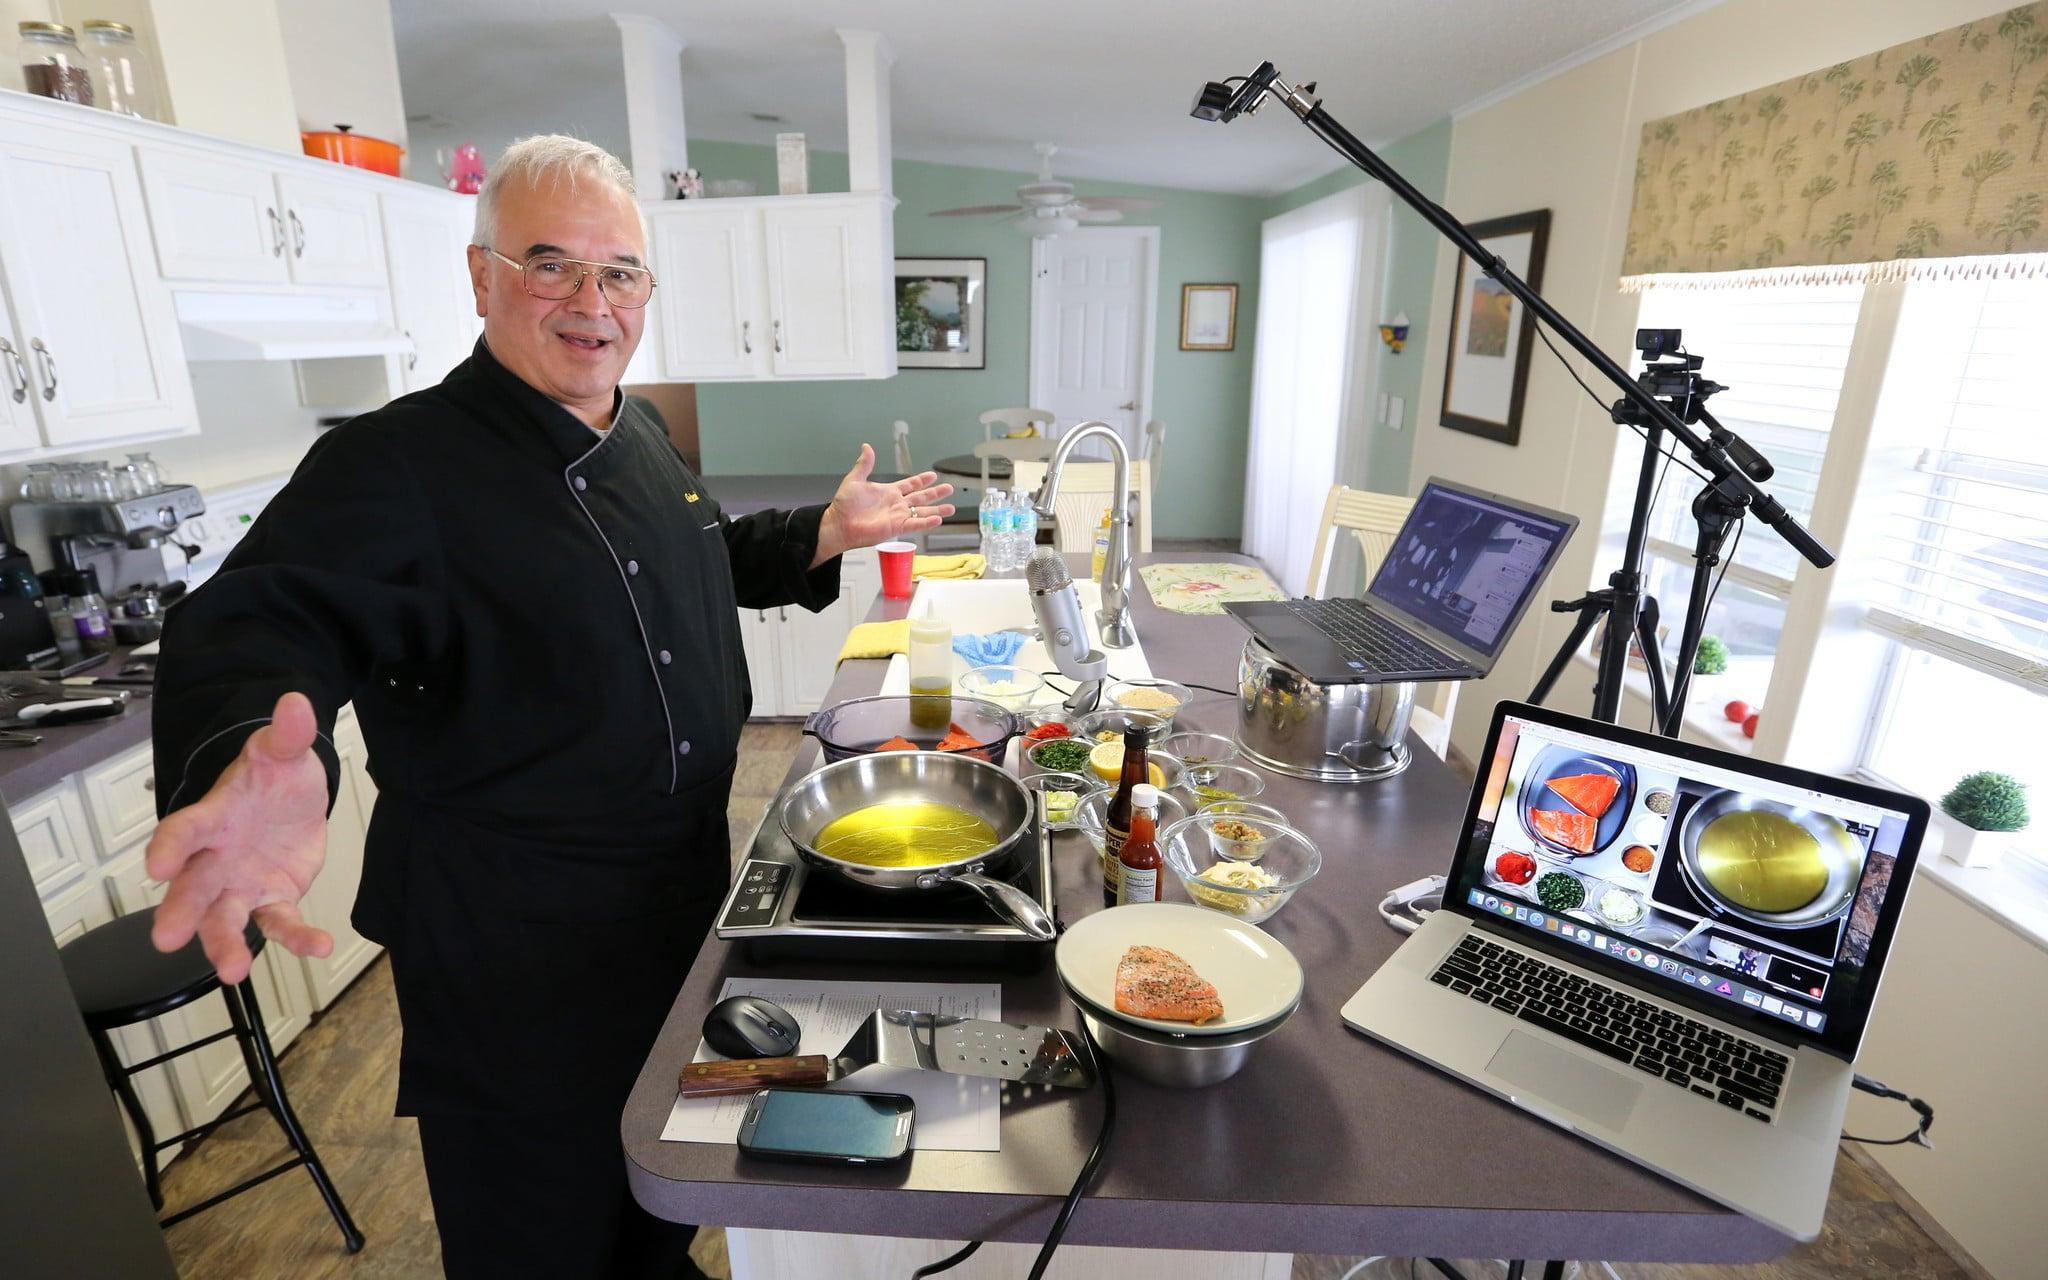 Chef Dennis Littley live streaming